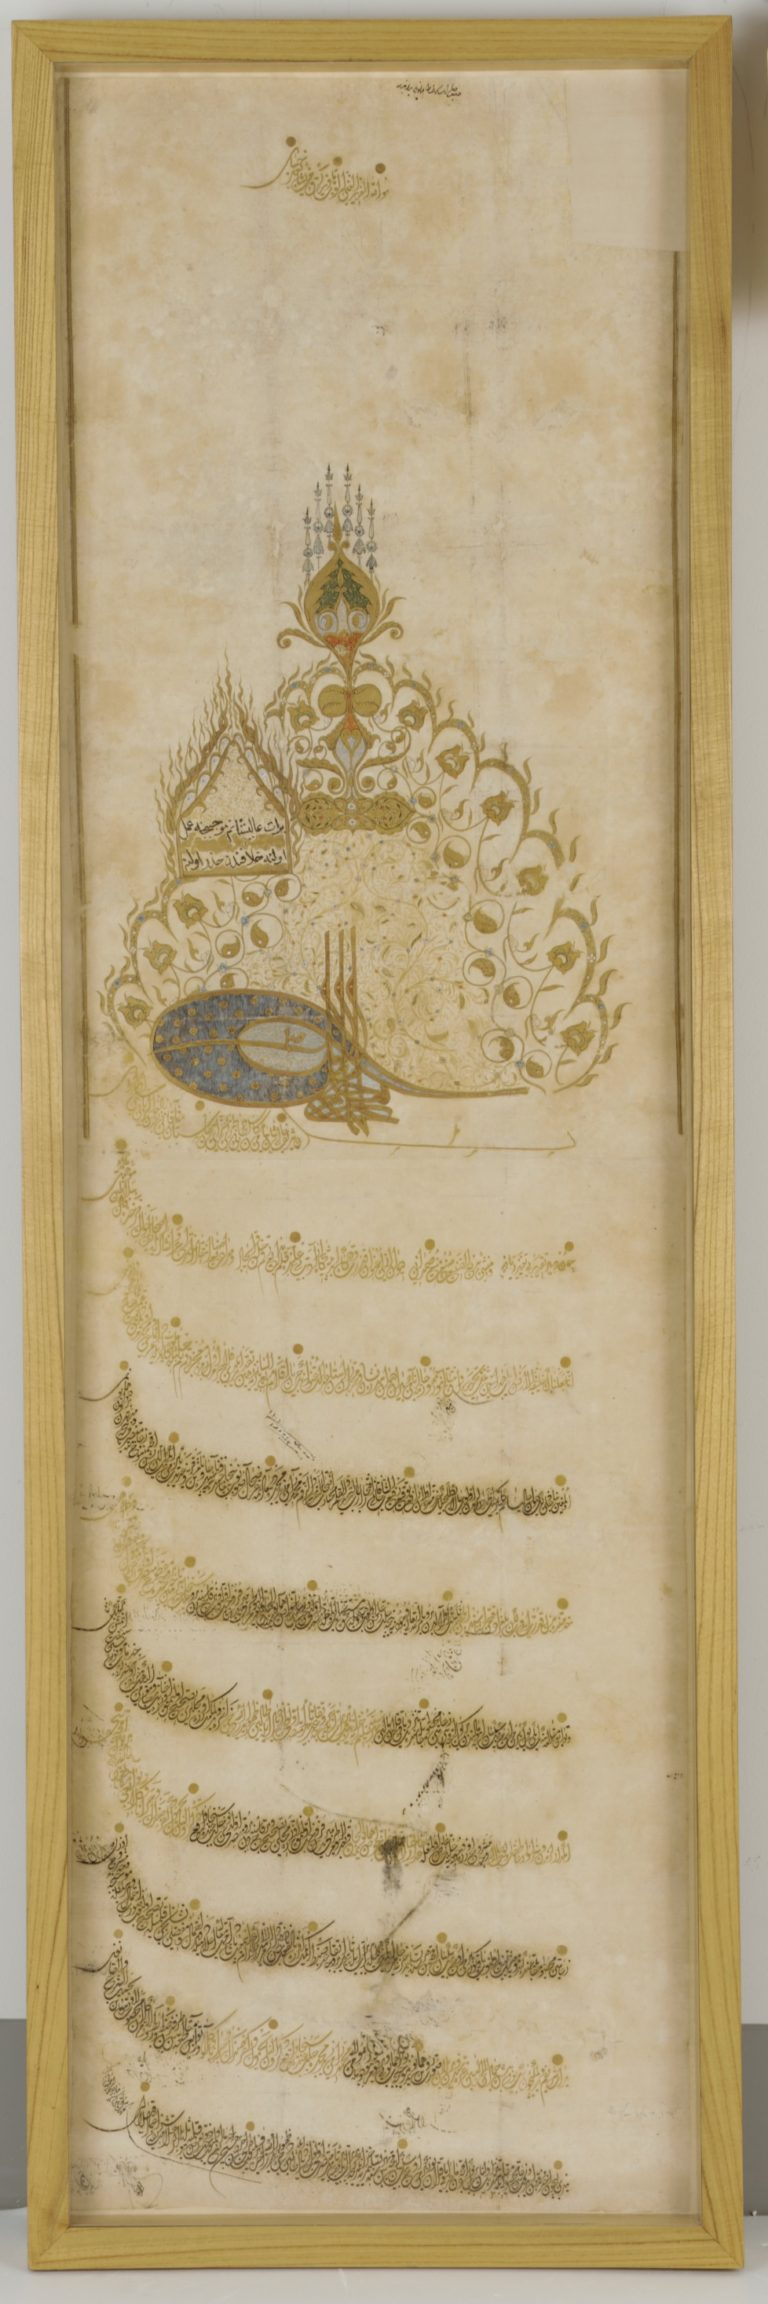 Imperial edict of Sultan Ahmed II